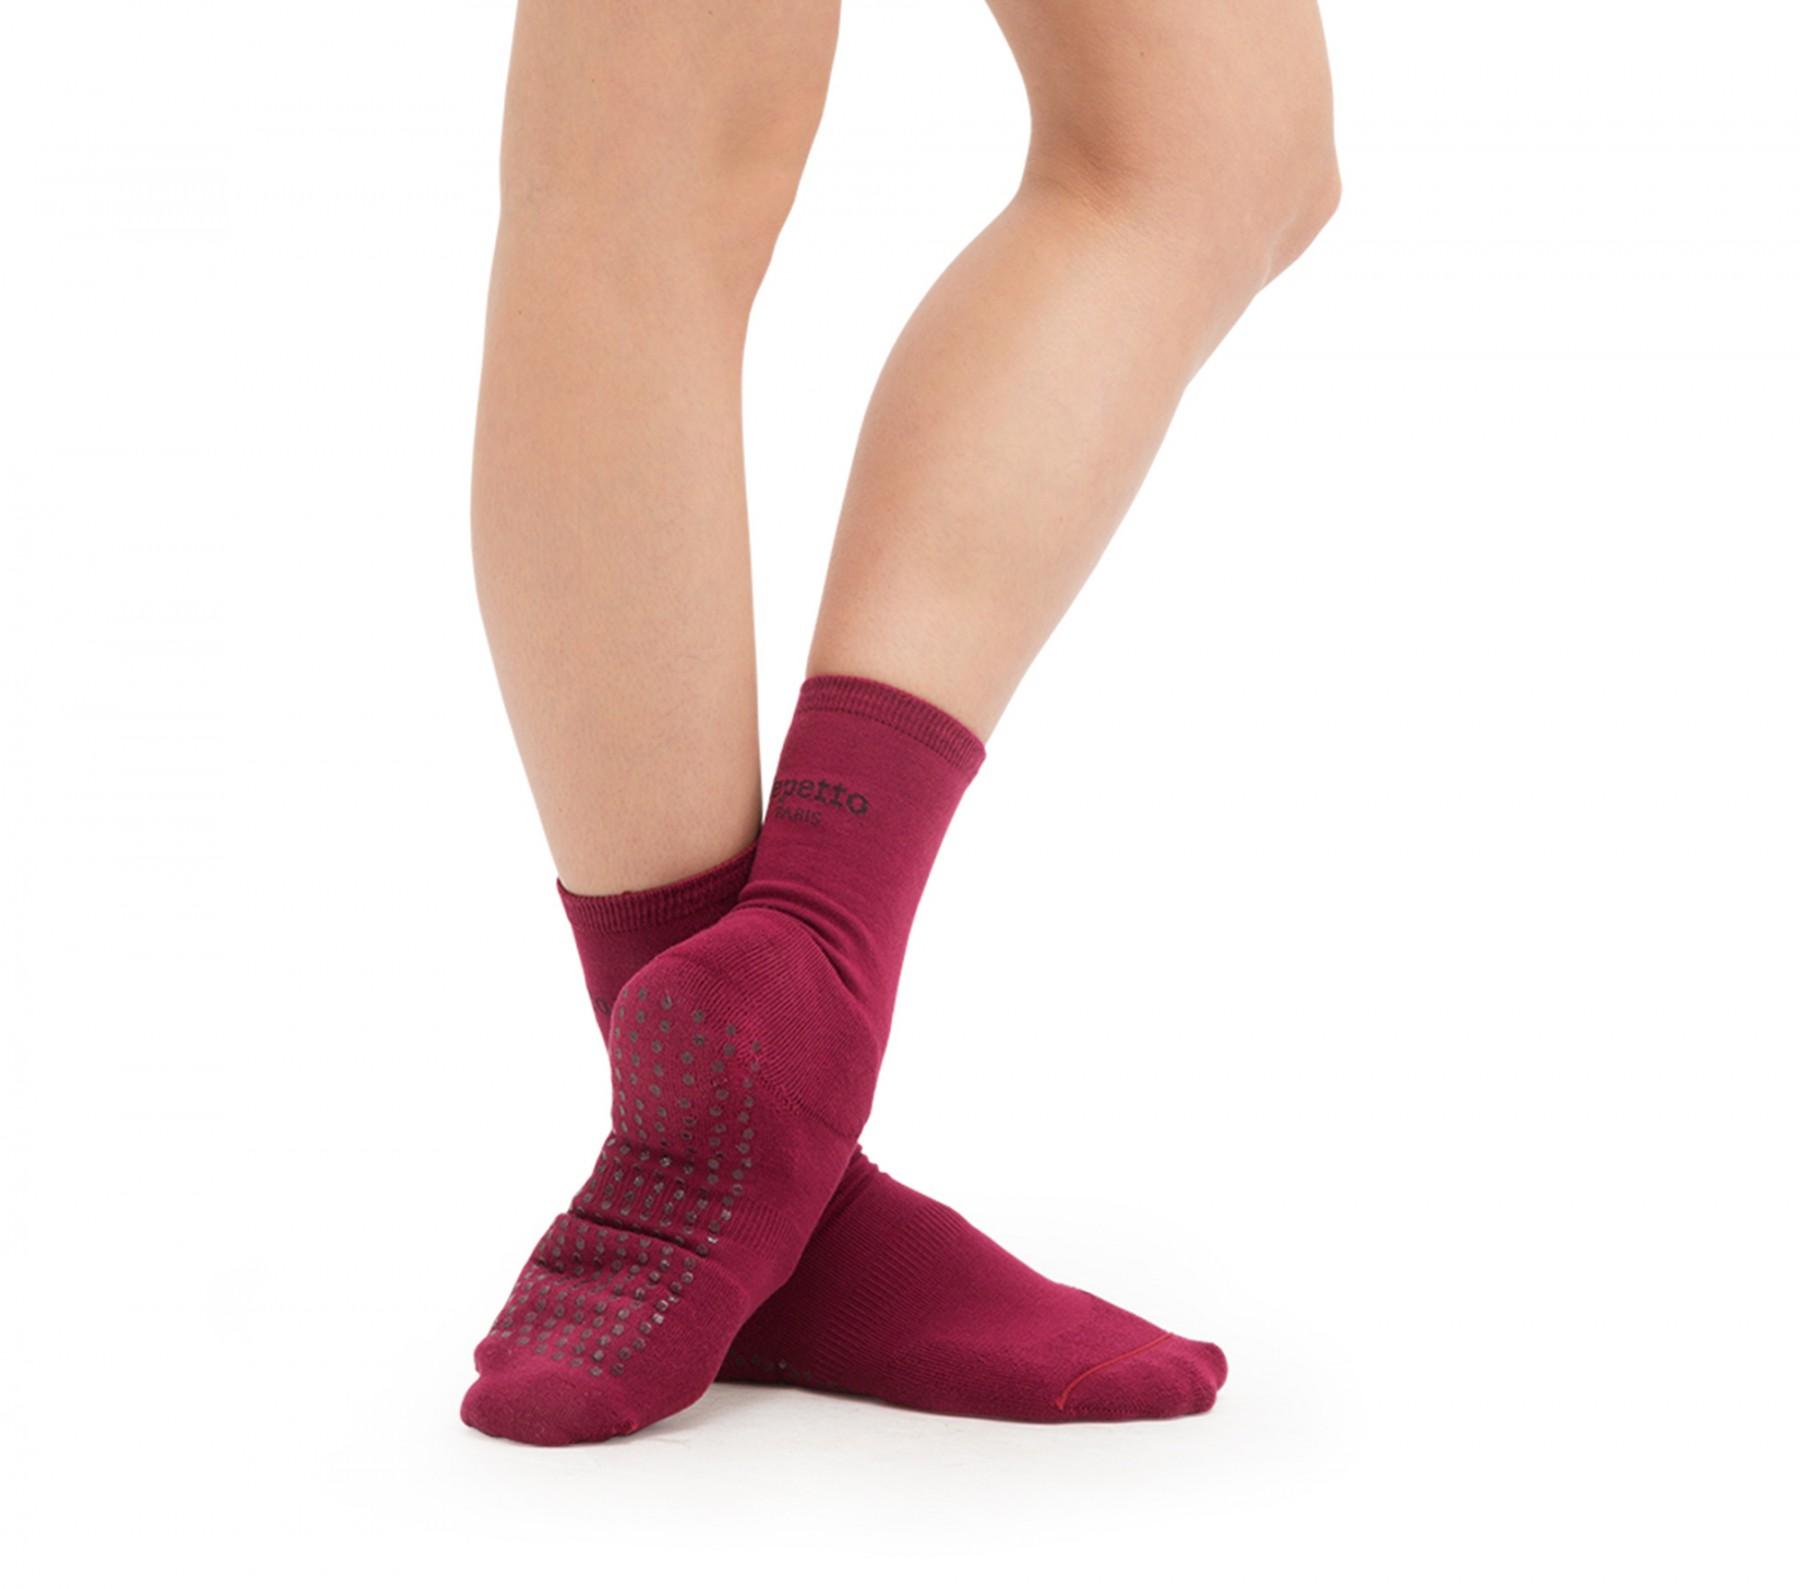 Anti slippery socks for warming up